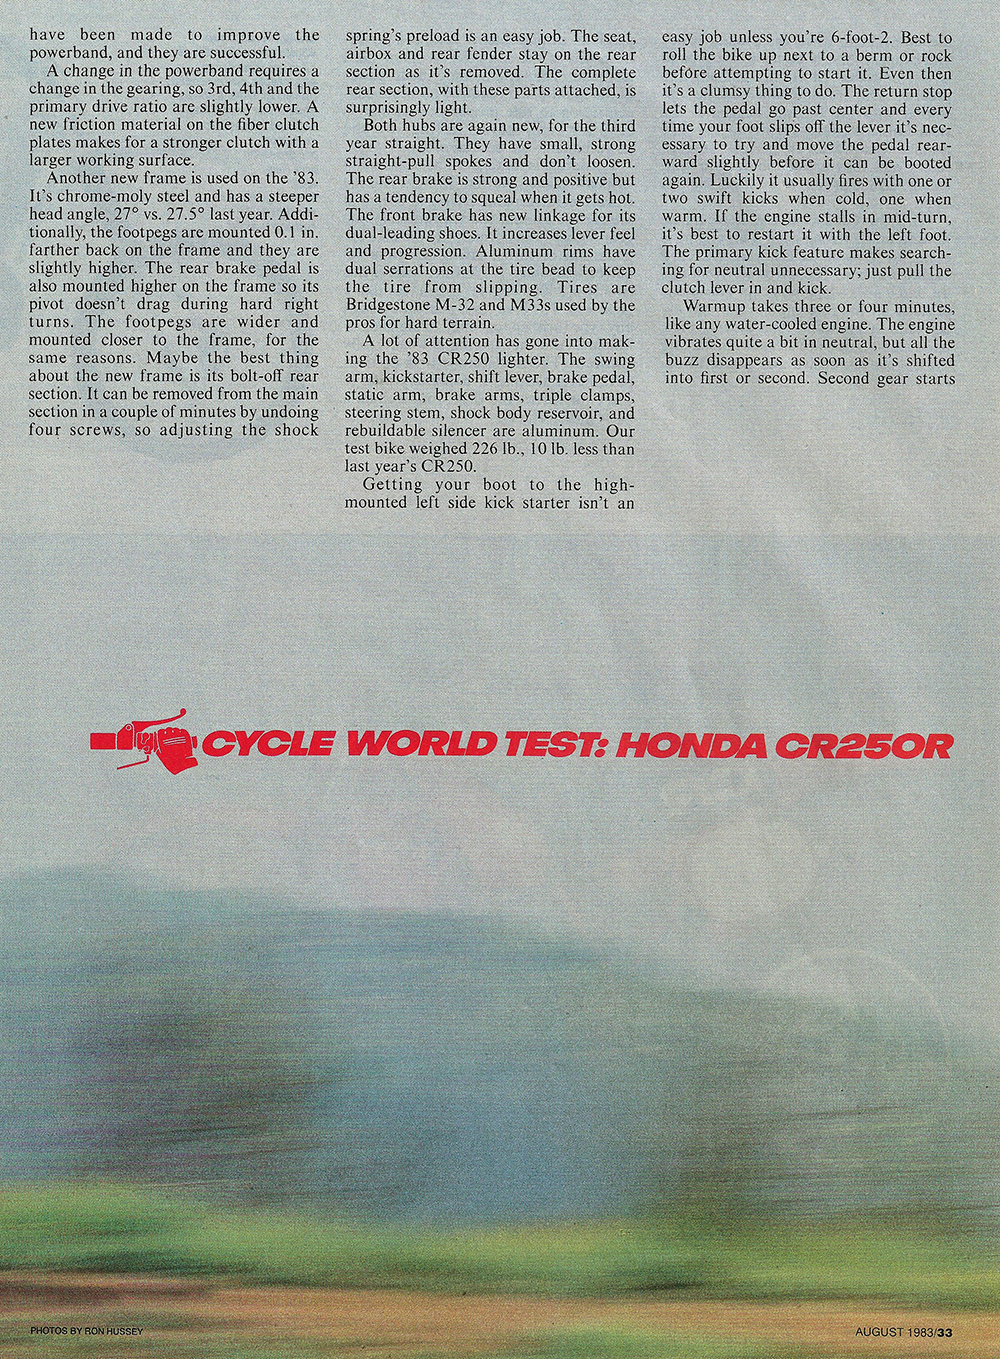 1983 Honda CR250R road test 02.jpg